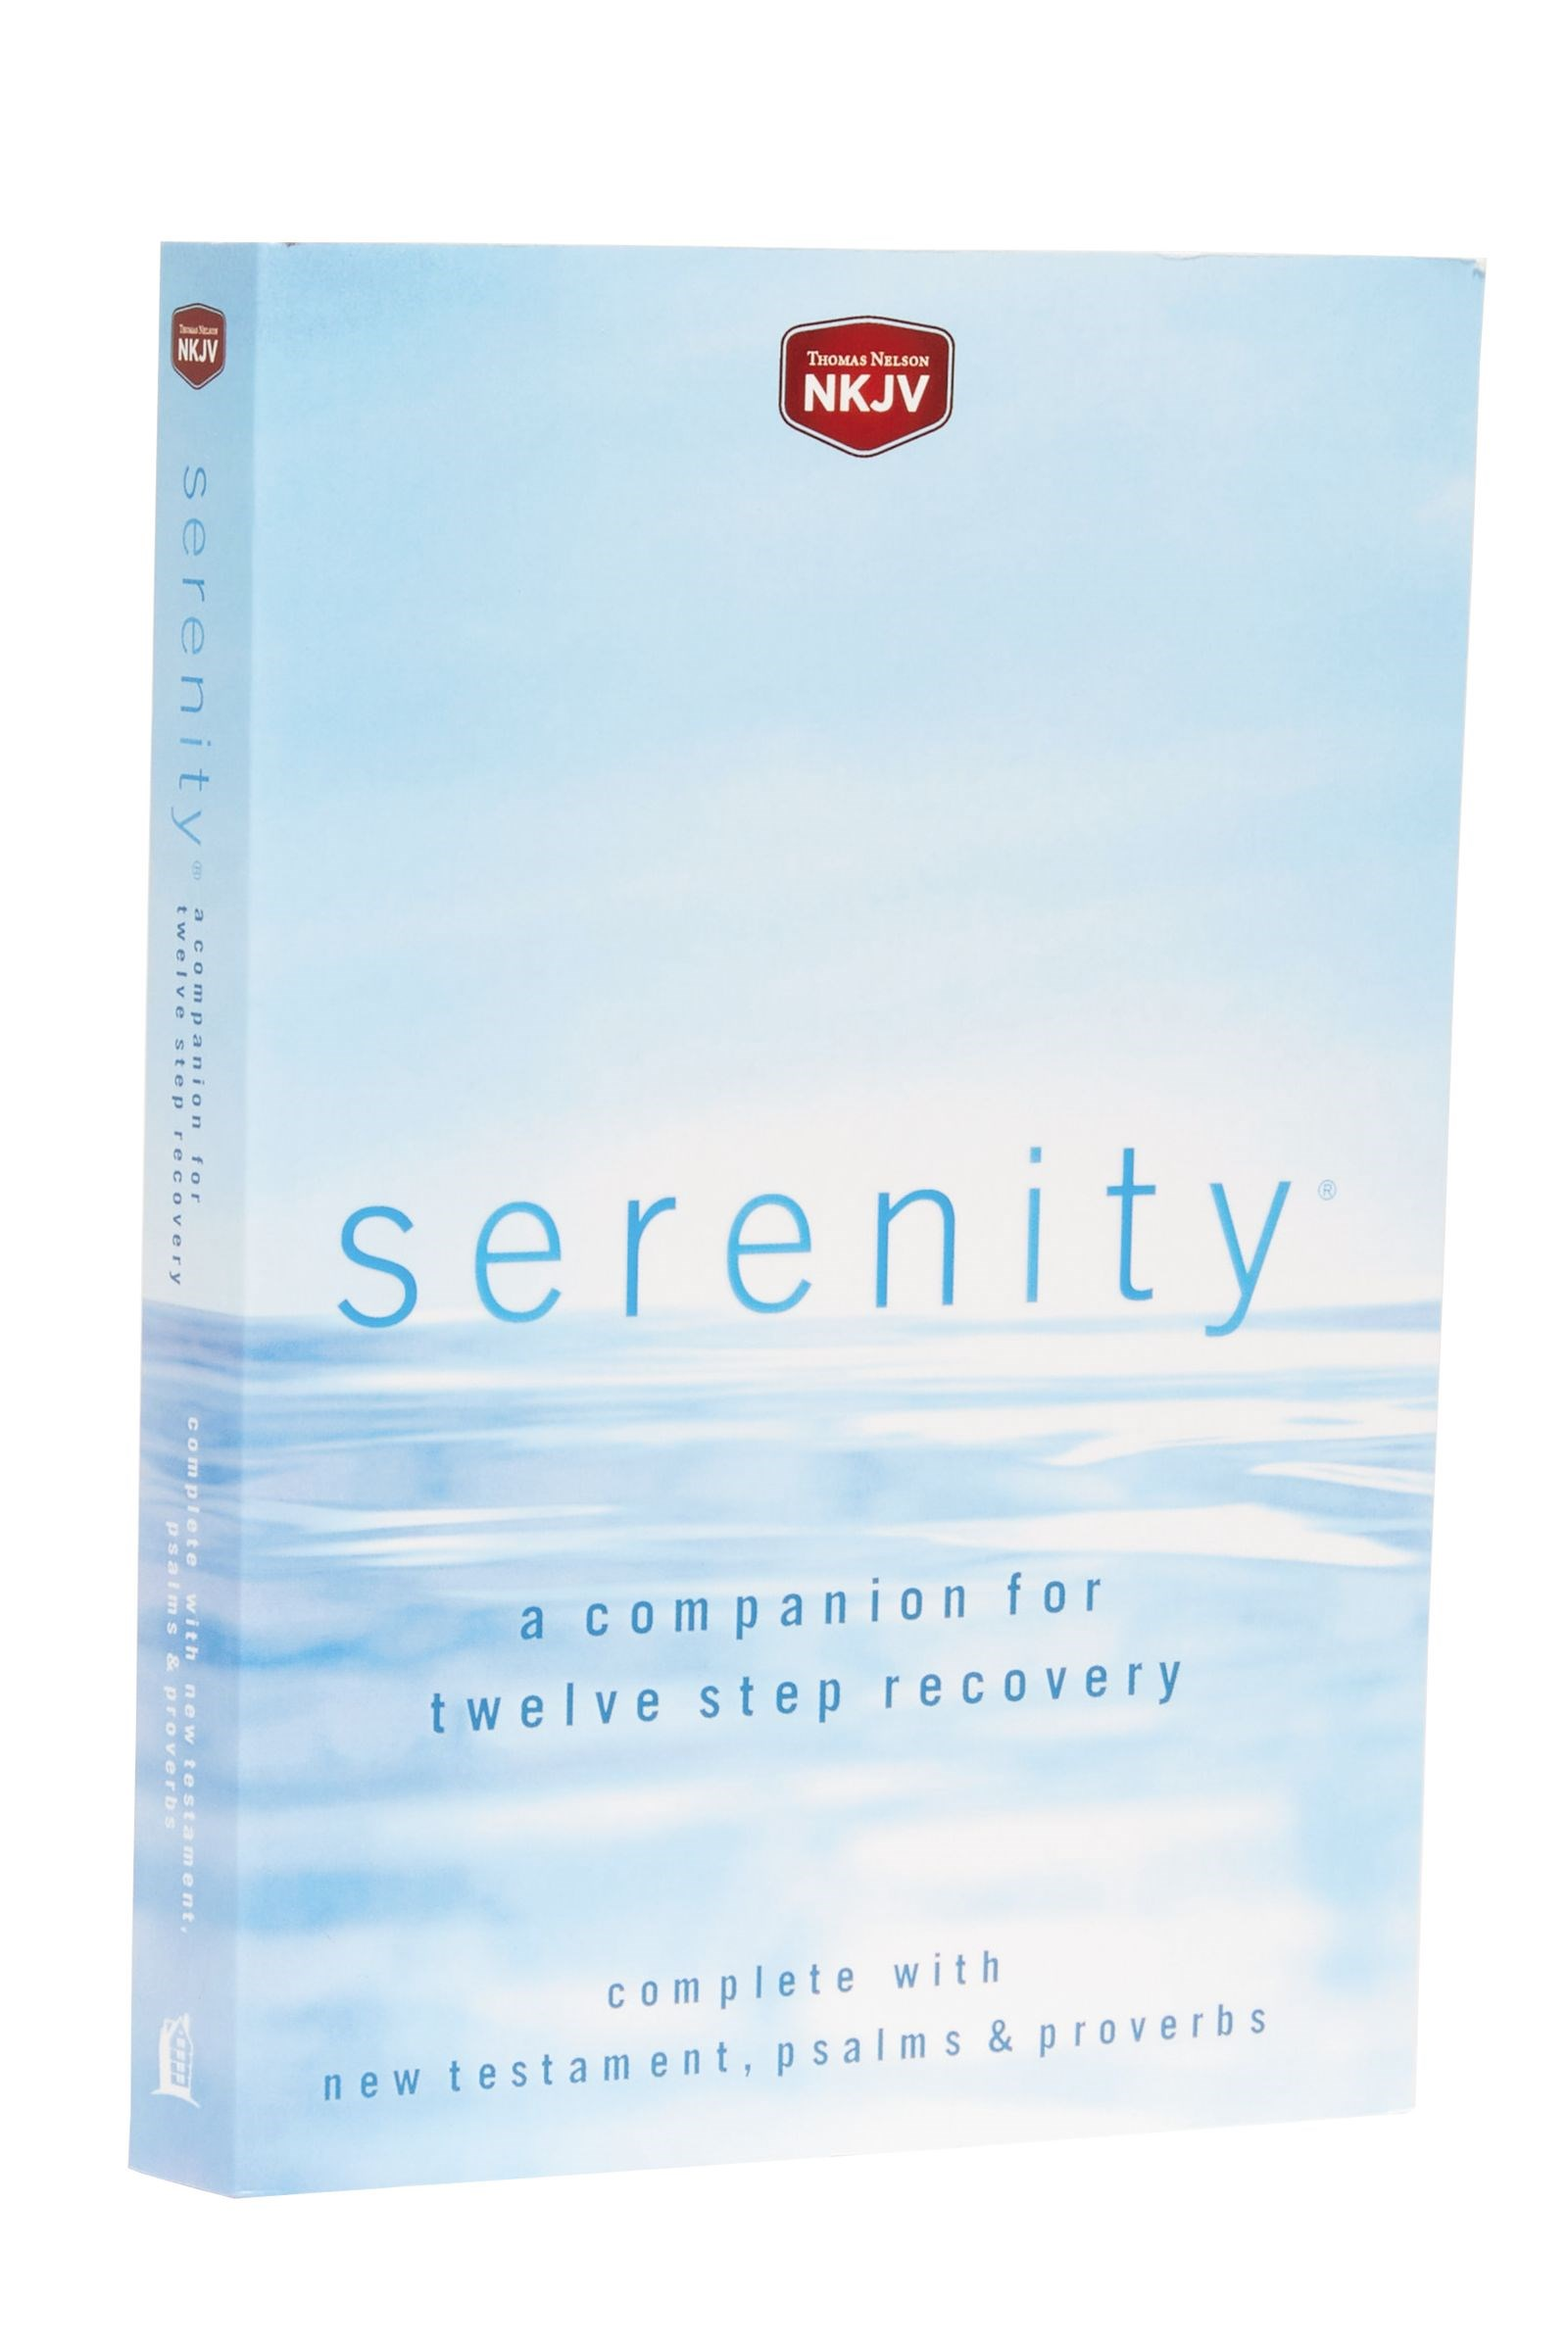 NKJV Serenity New Testament w/Psalms & Proverbs-Softcover